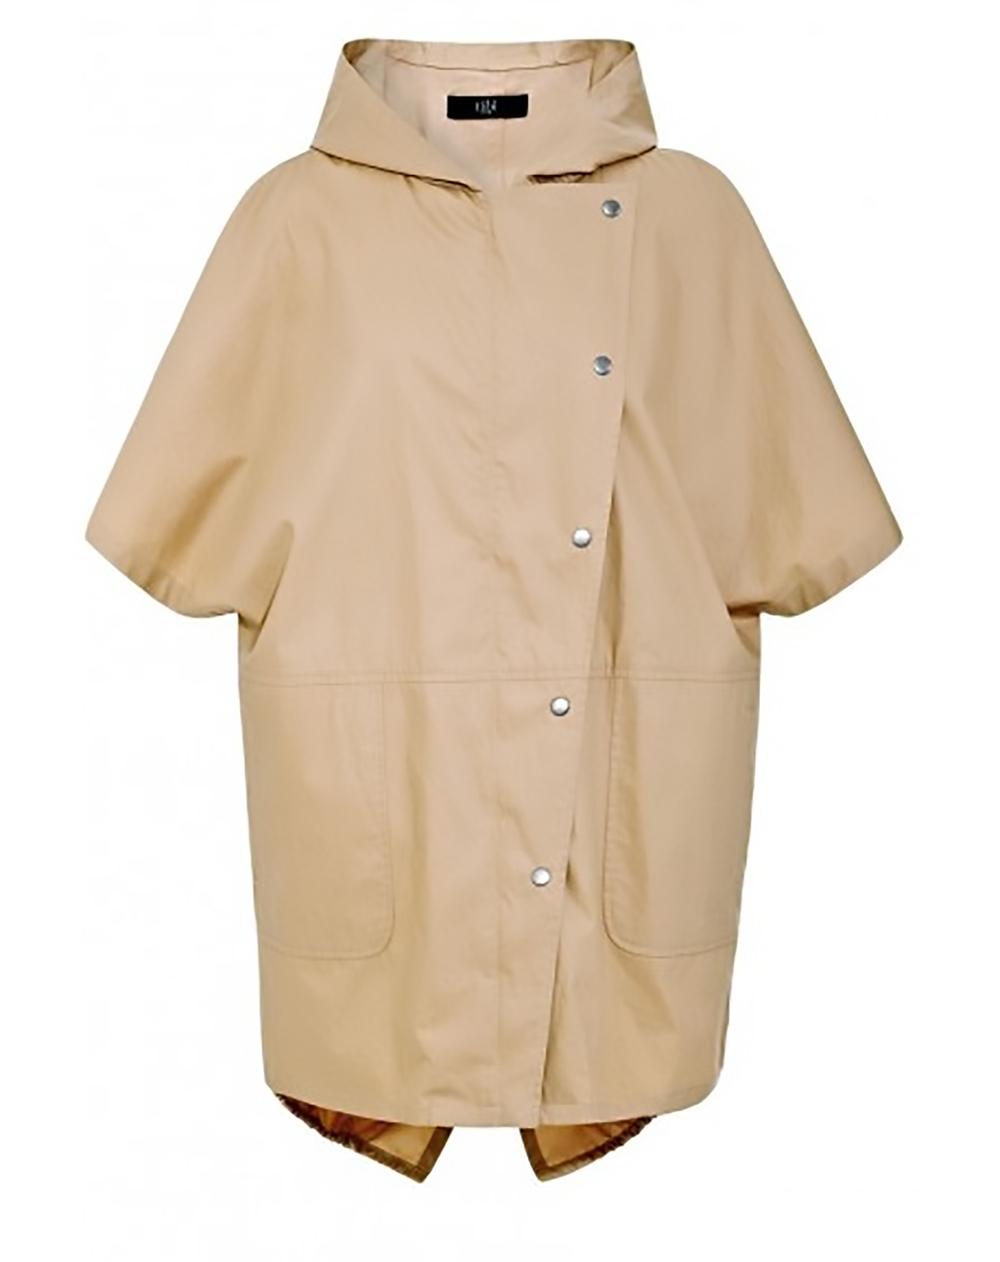 shop les nouvelles seal anorak tibi rain gear 1500.jpg